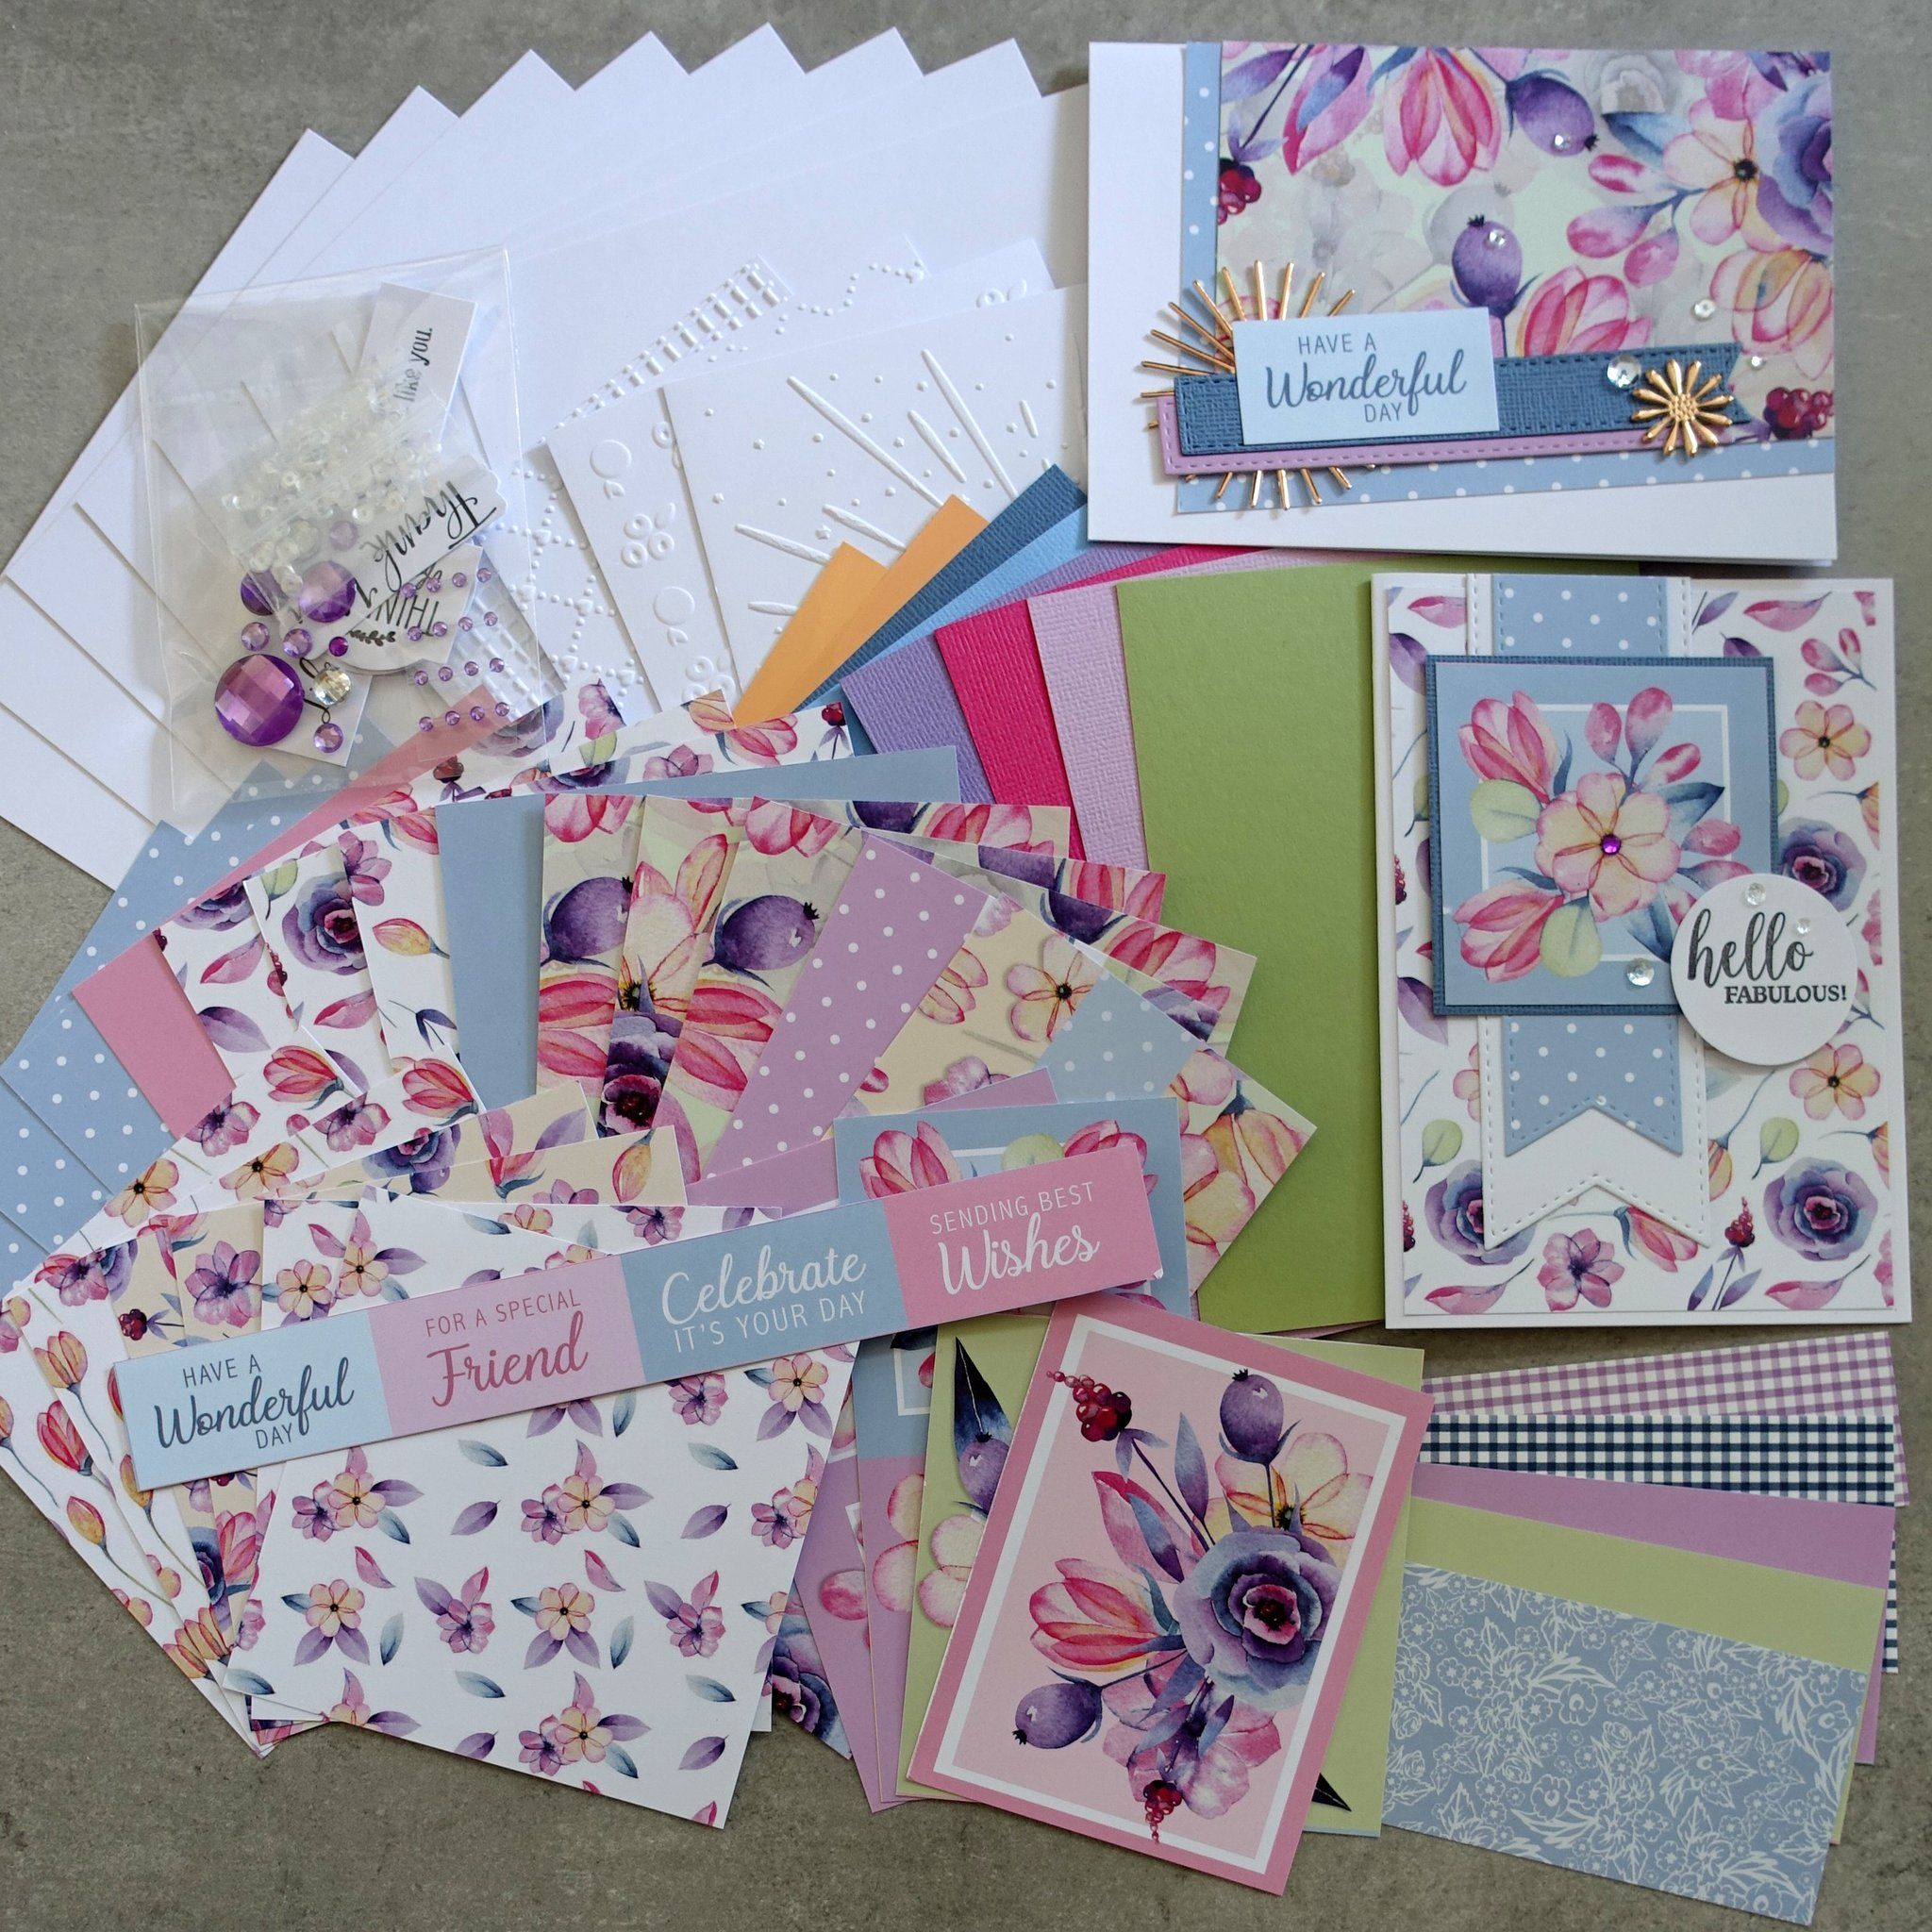 Boho Blooms Floral Flowers Botanical 6x4 A5 Card Paper Pack 1 60 Pie Shopaperartz Cardmaking Paper Pack Floral Flowers